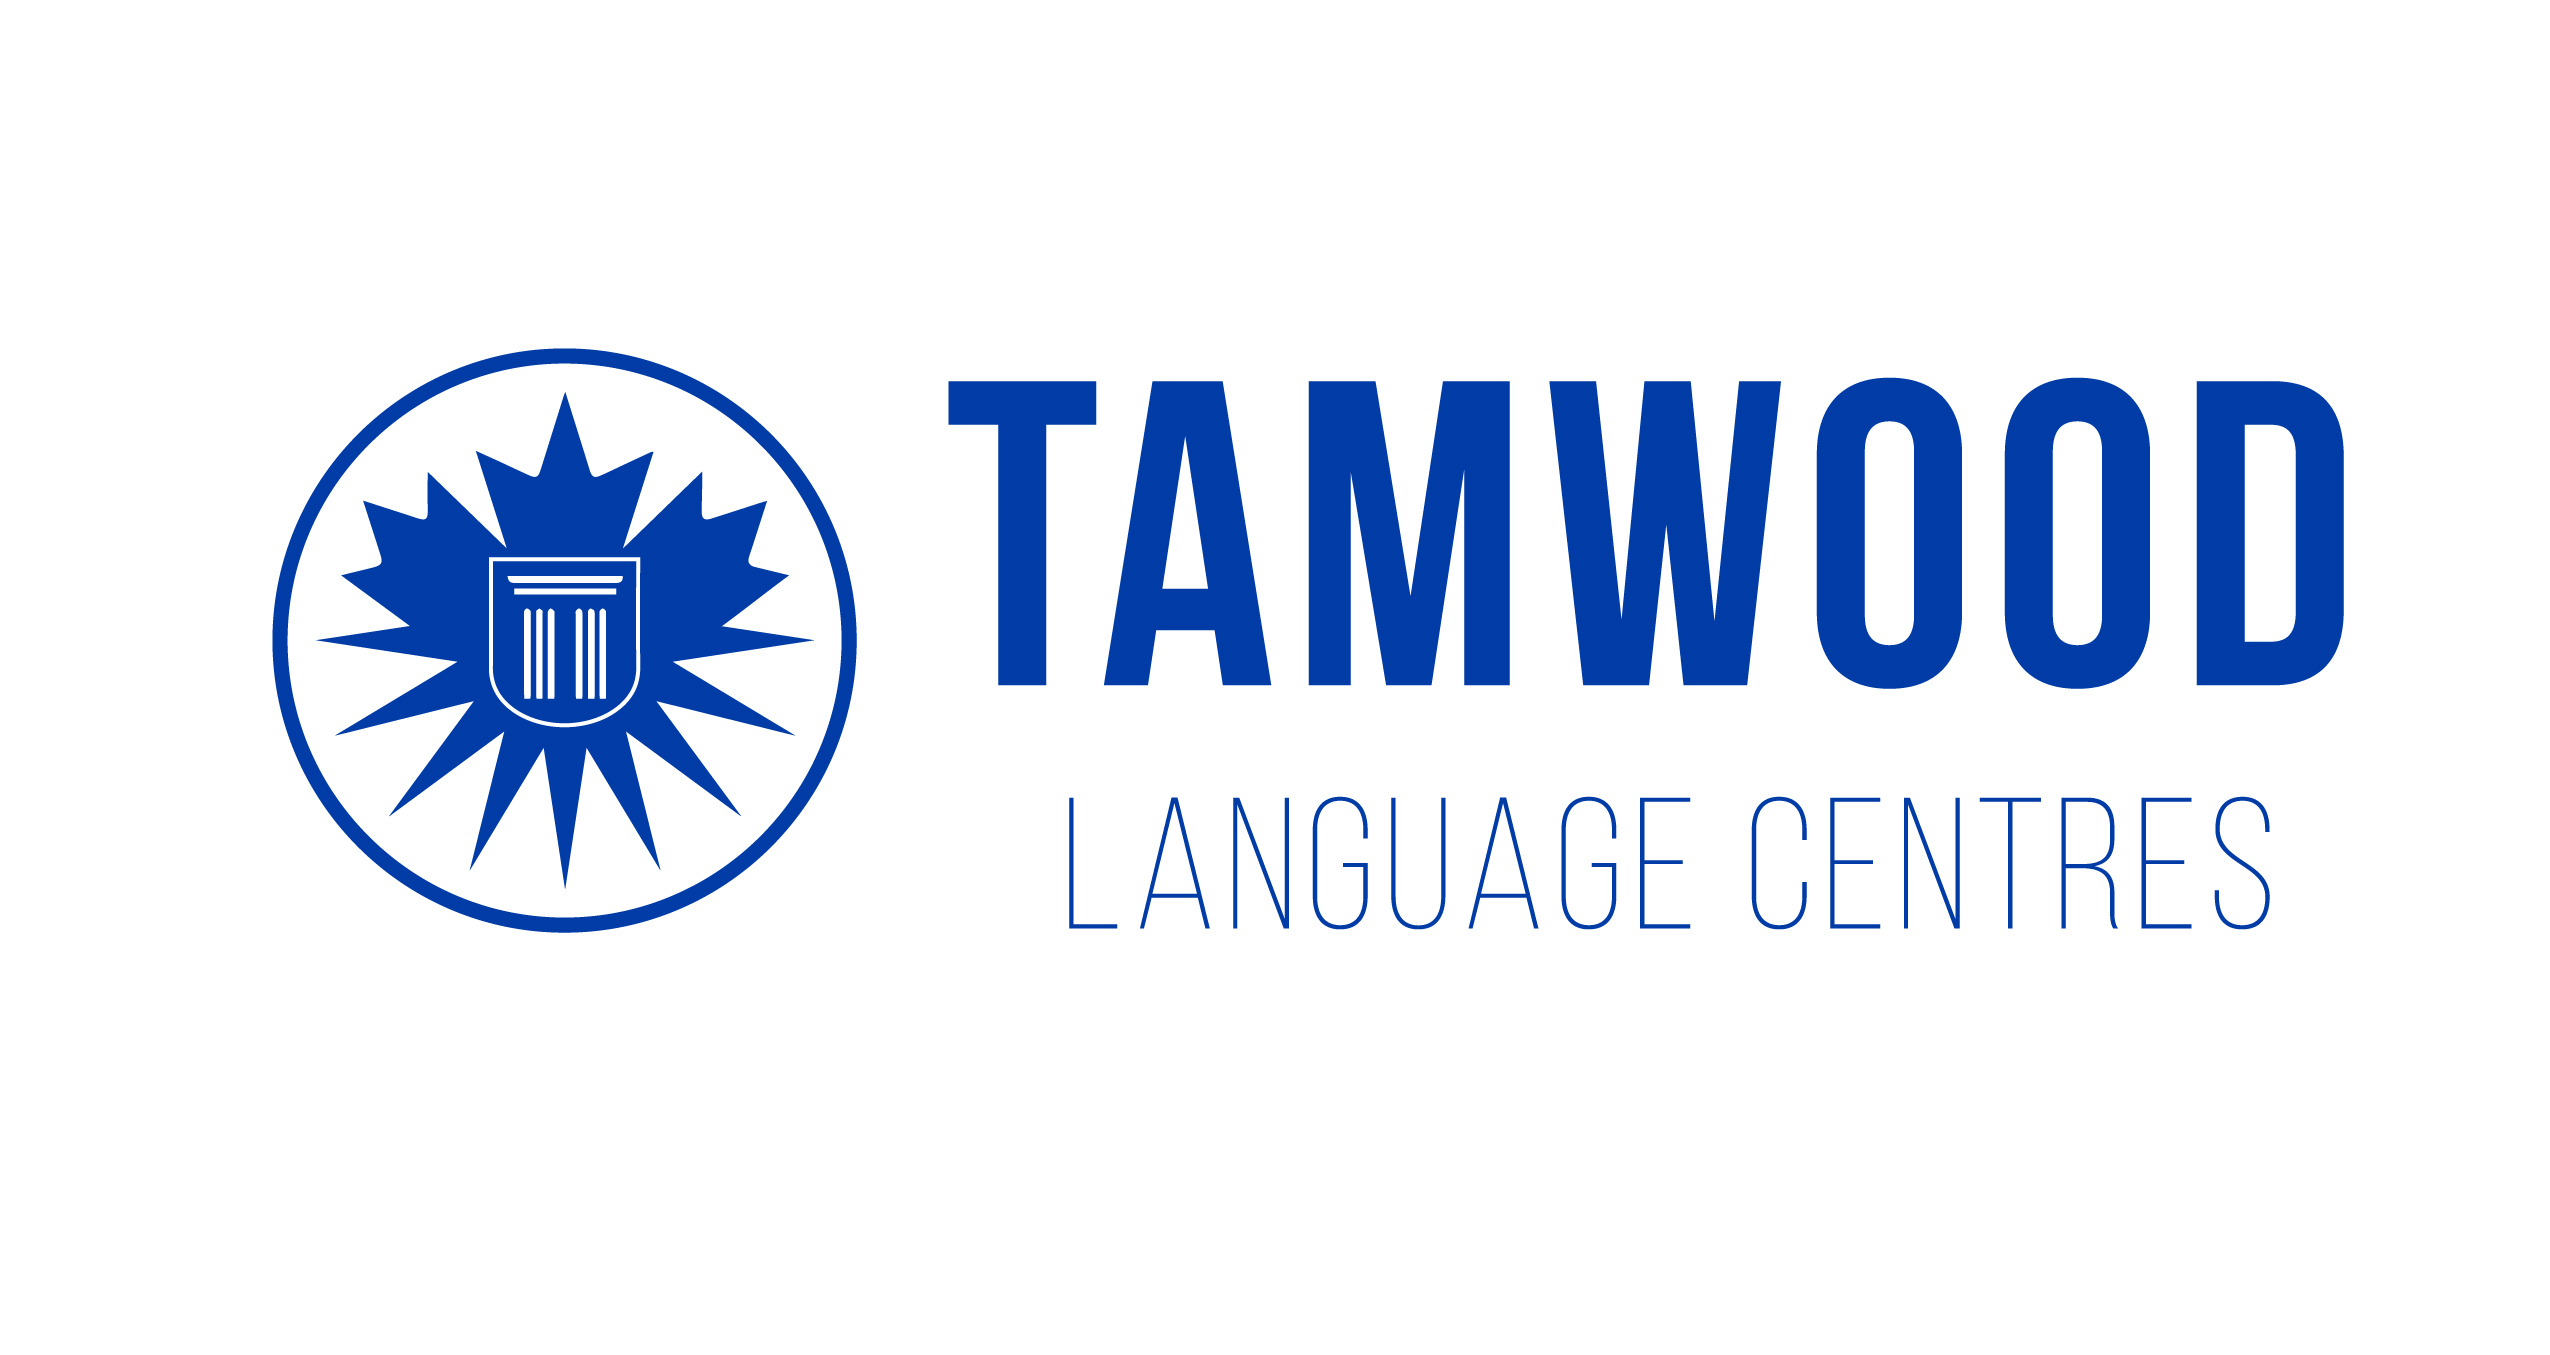 TAMWOOD